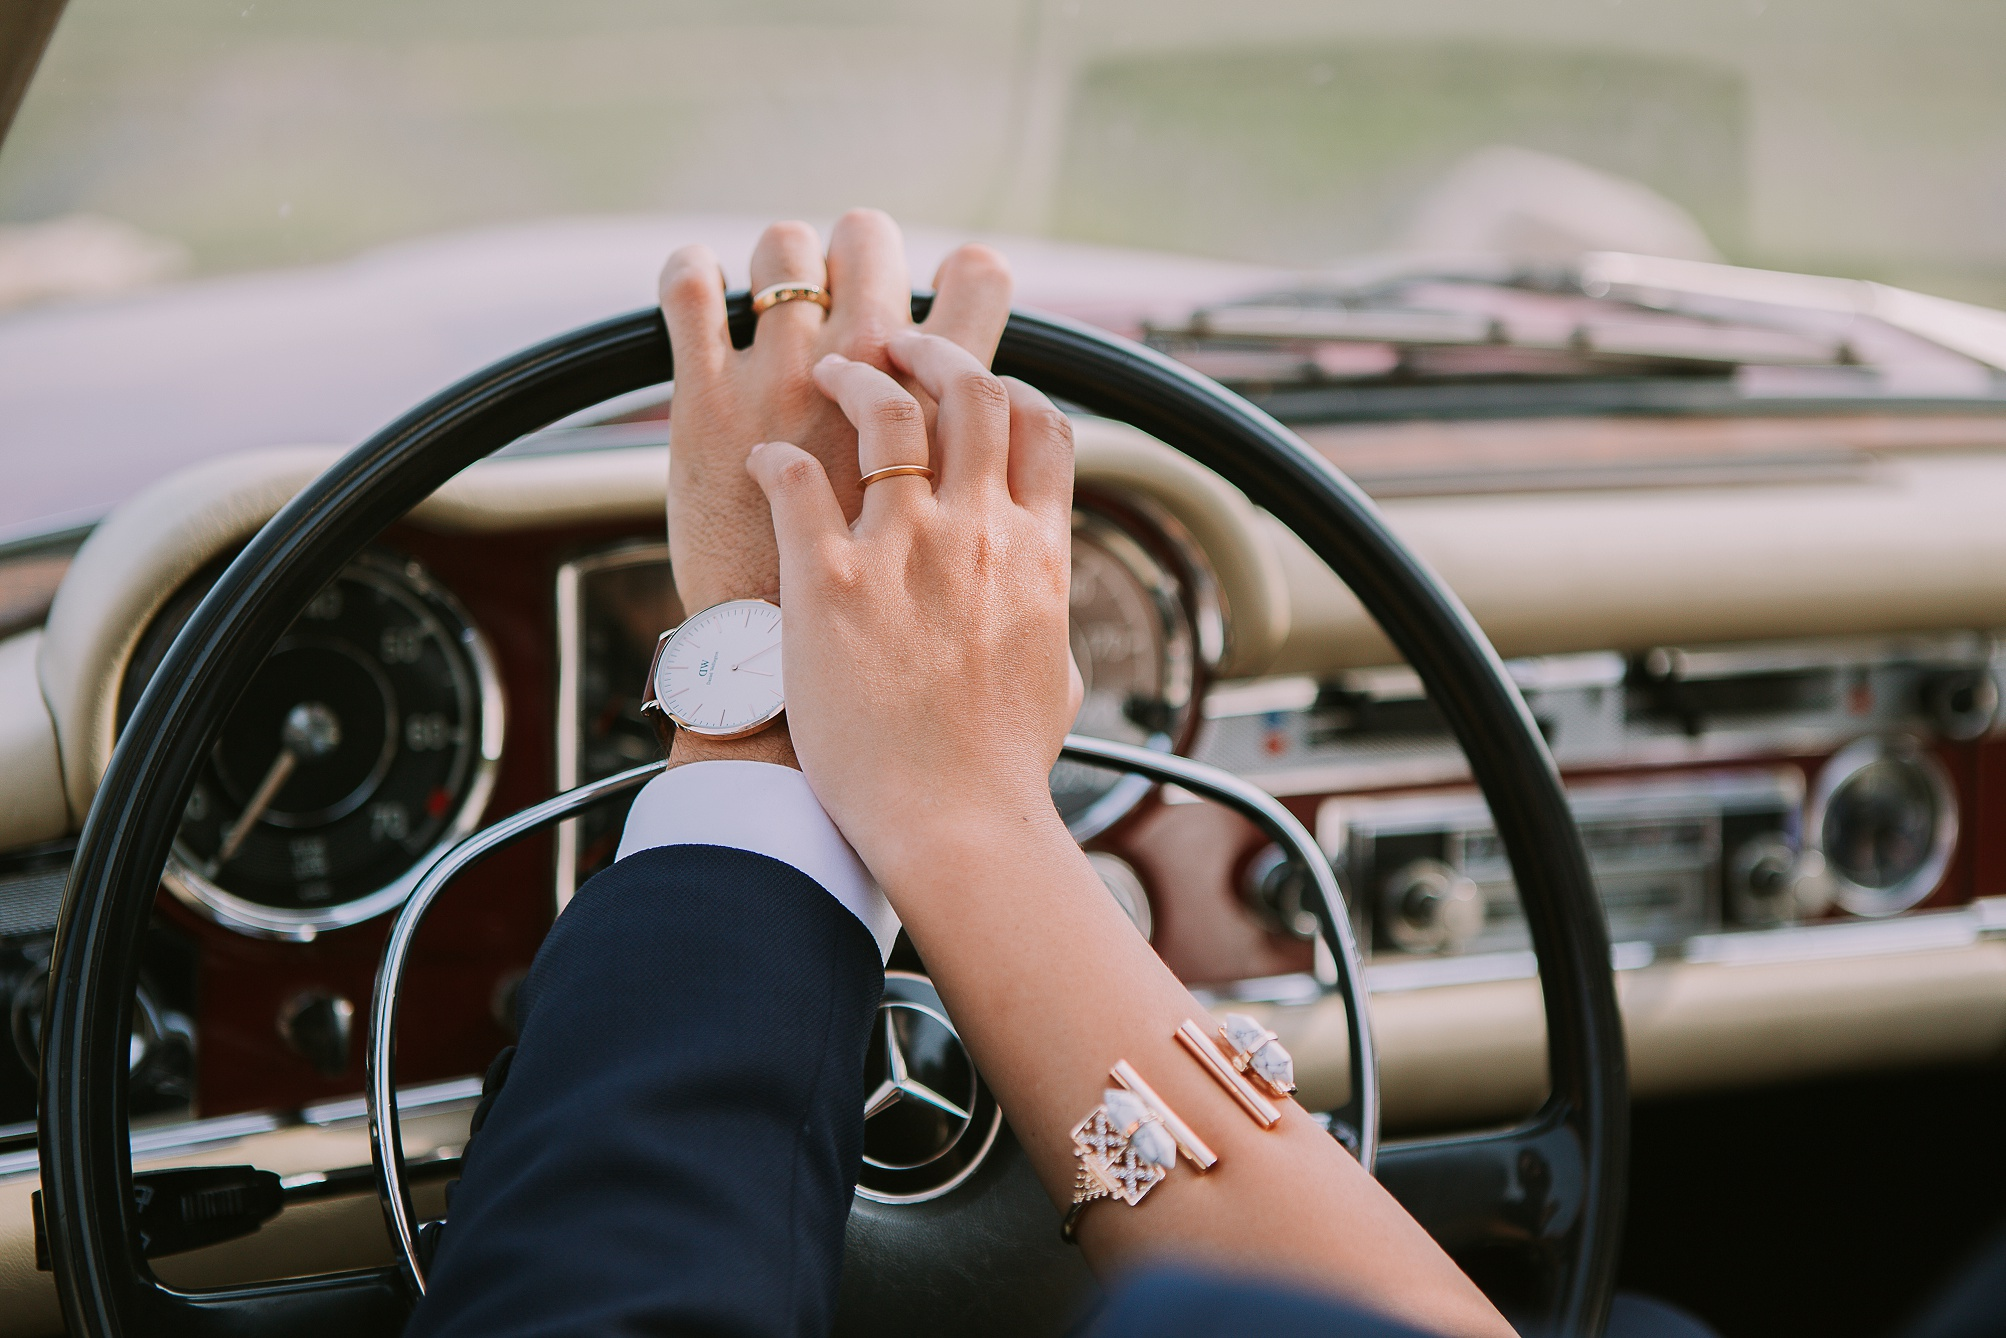 katerynaphotos-mariage-photographe-puyloubier-provence-aix-en-provence-sud-de-la-france_0406.jpg